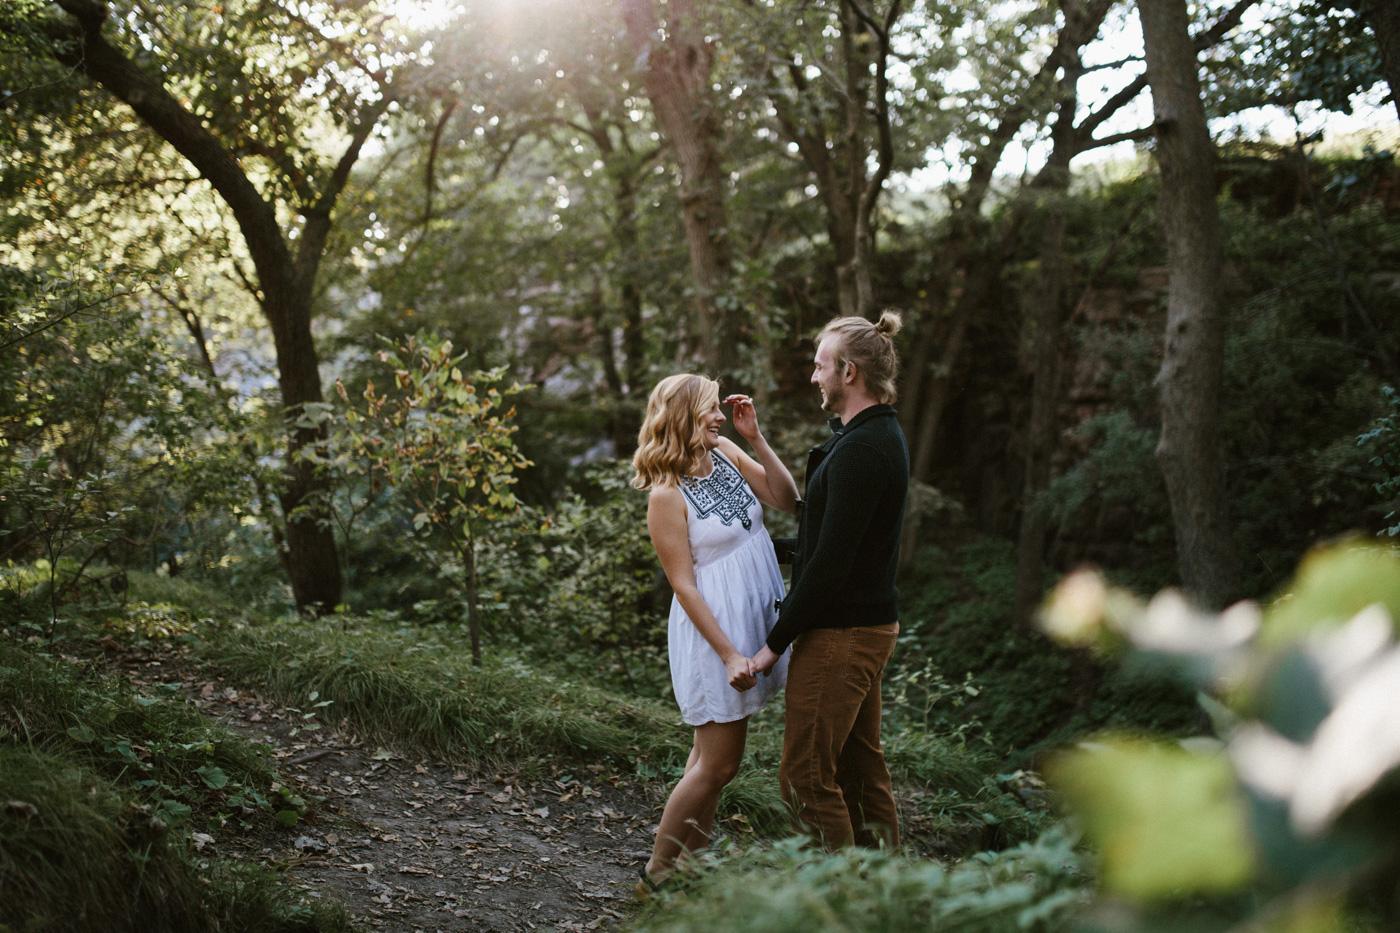 Sioux_Falls_Des_Moines_Engagement_Wedding_Photographer_04.jpg